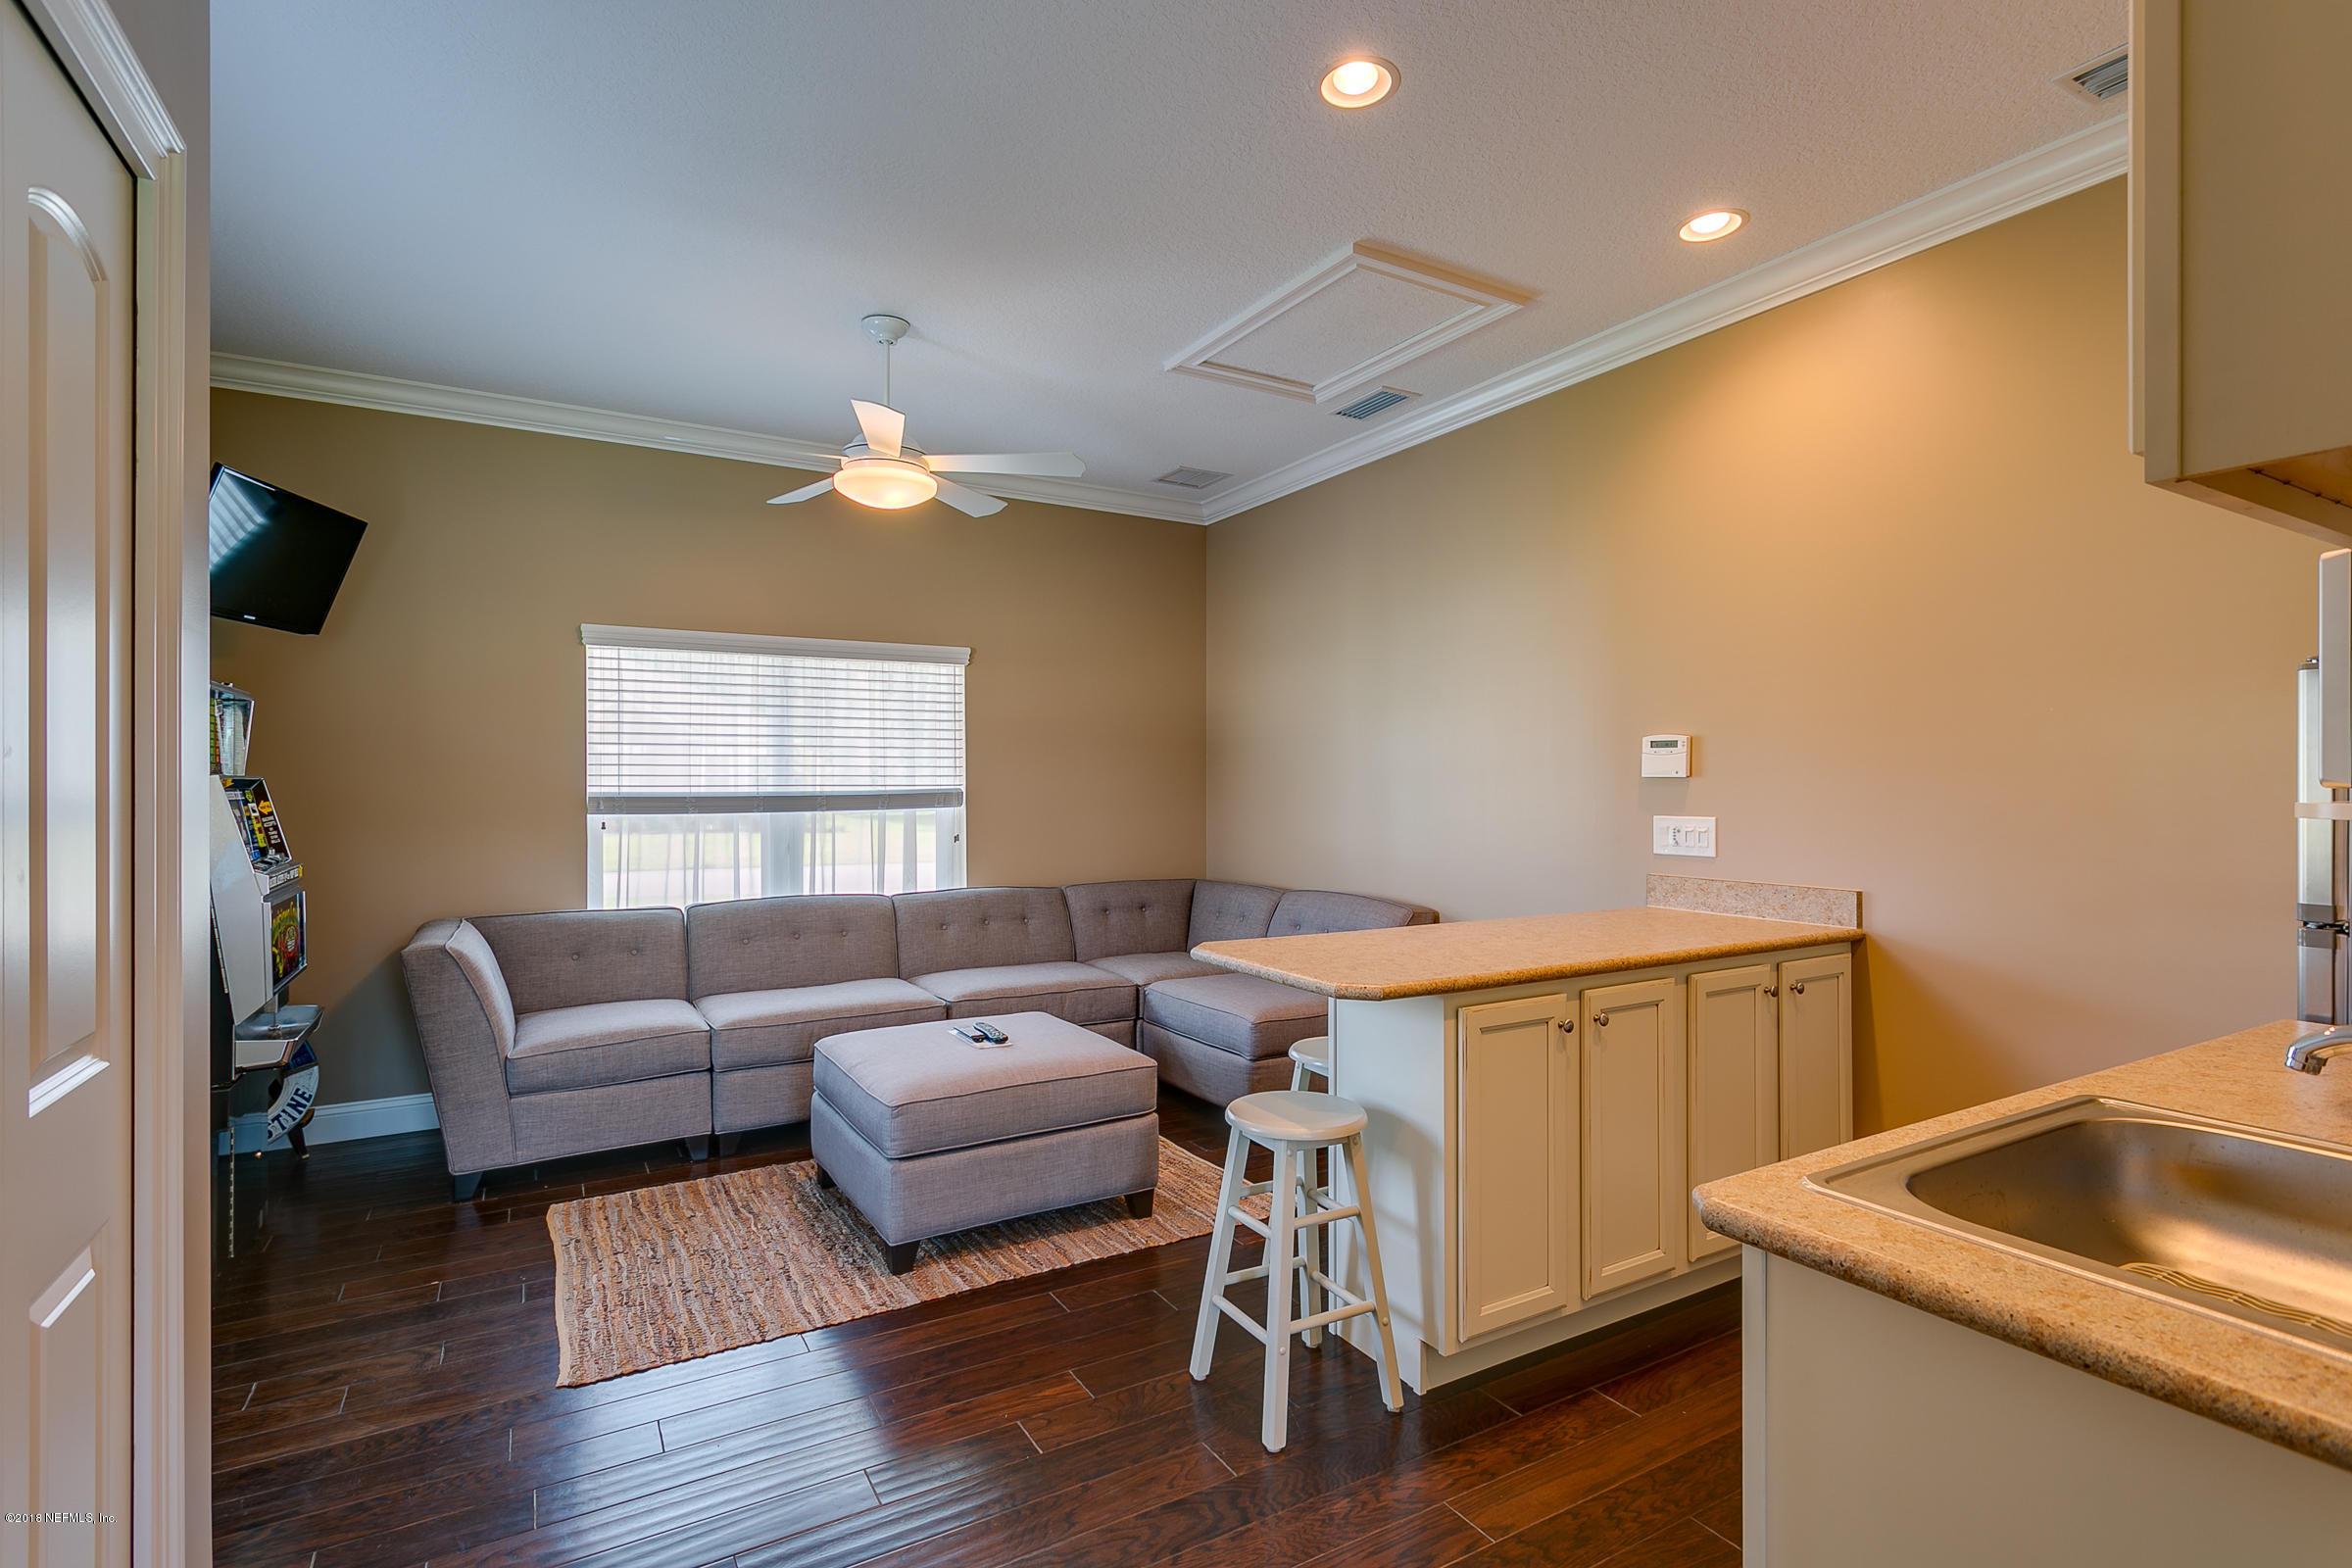 243 DEERFIELD GLEN, ST AUGUSTINE, FLORIDA 32086, 3 Bedrooms Bedrooms, ,3 BathroomsBathrooms,Residential - single family,For sale,DEERFIELD GLEN,952281